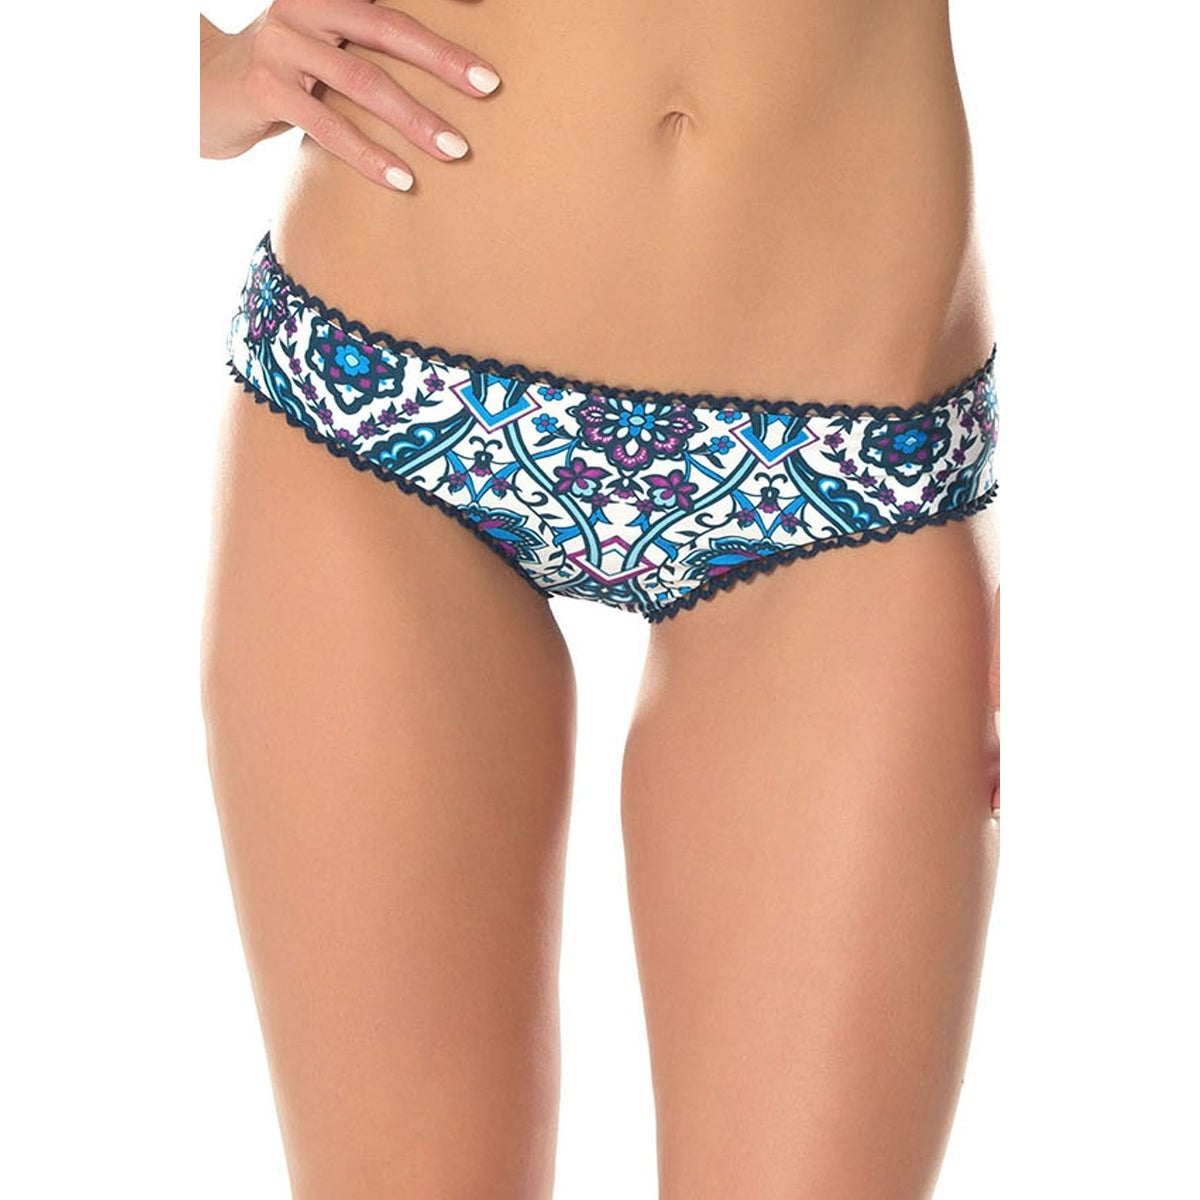 a900988db8c Shop Becca NEW Blue Women's Size Small S Reversible Bikini Bottom Swimwear  - Free Shipping On Orders Over $45 - Overstock - 20232062